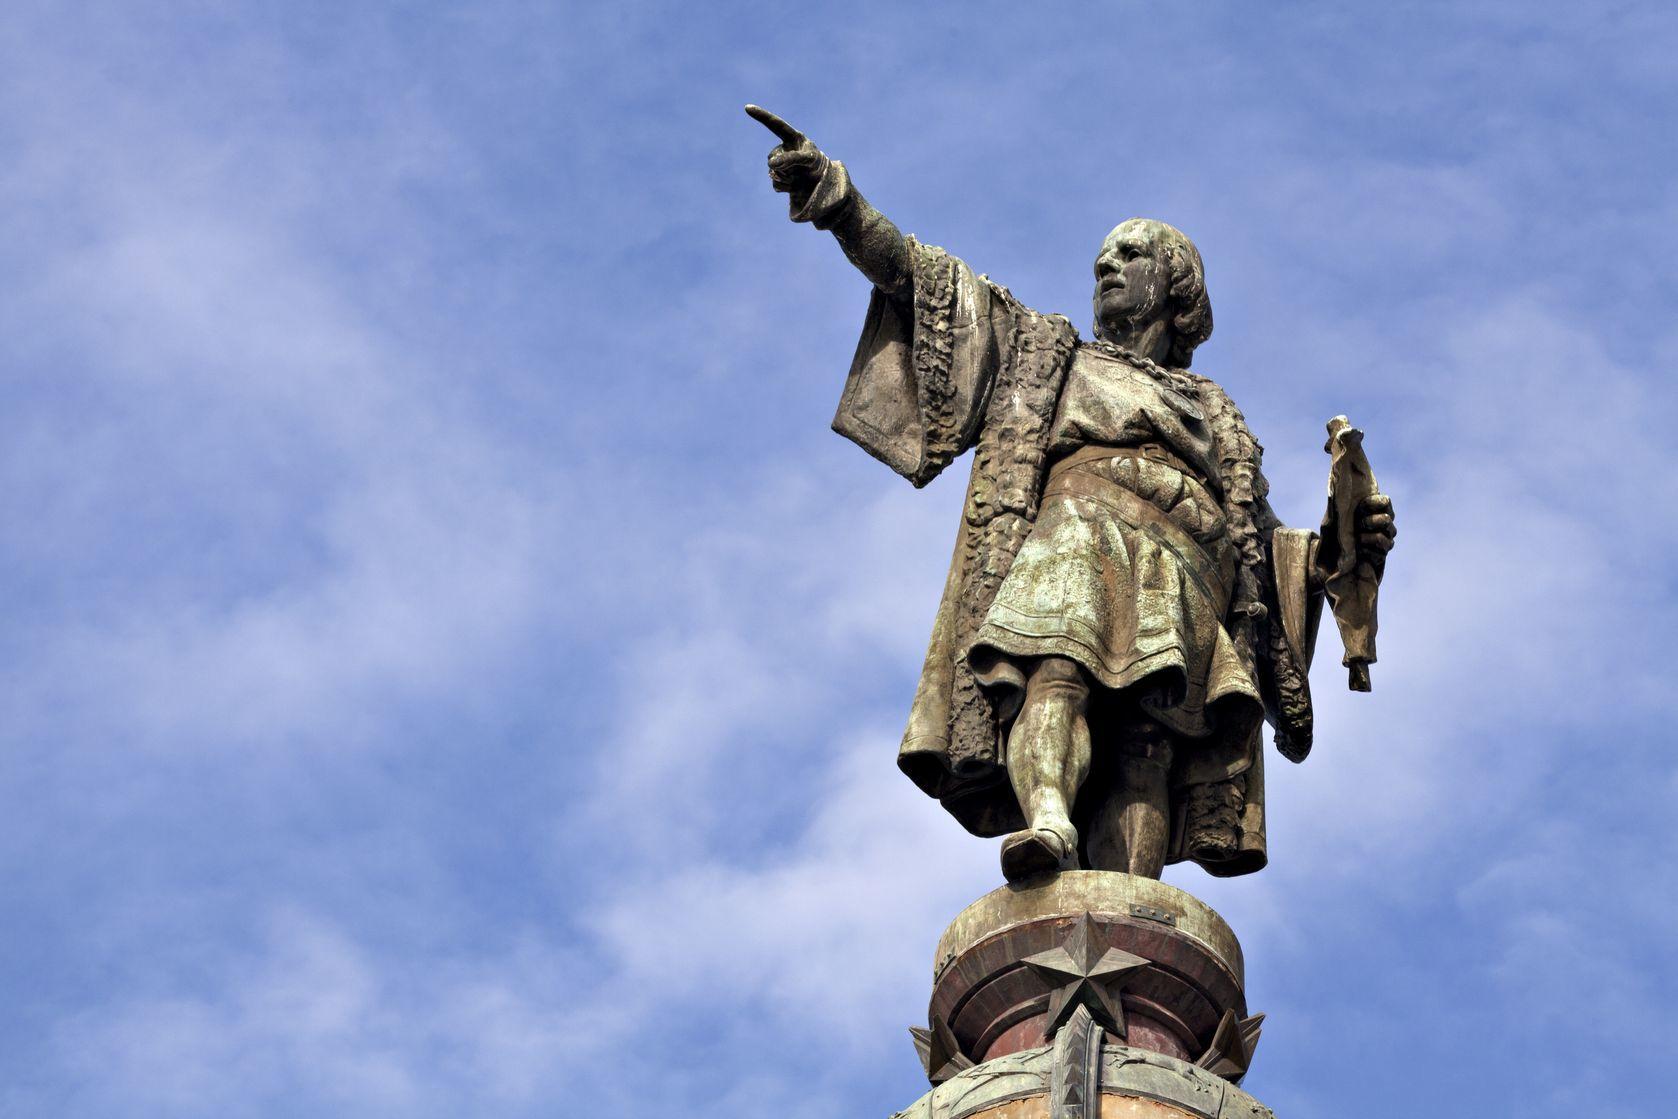 Socha Kryštofa Kolumba v Barceloně   igercelman/123RF.com